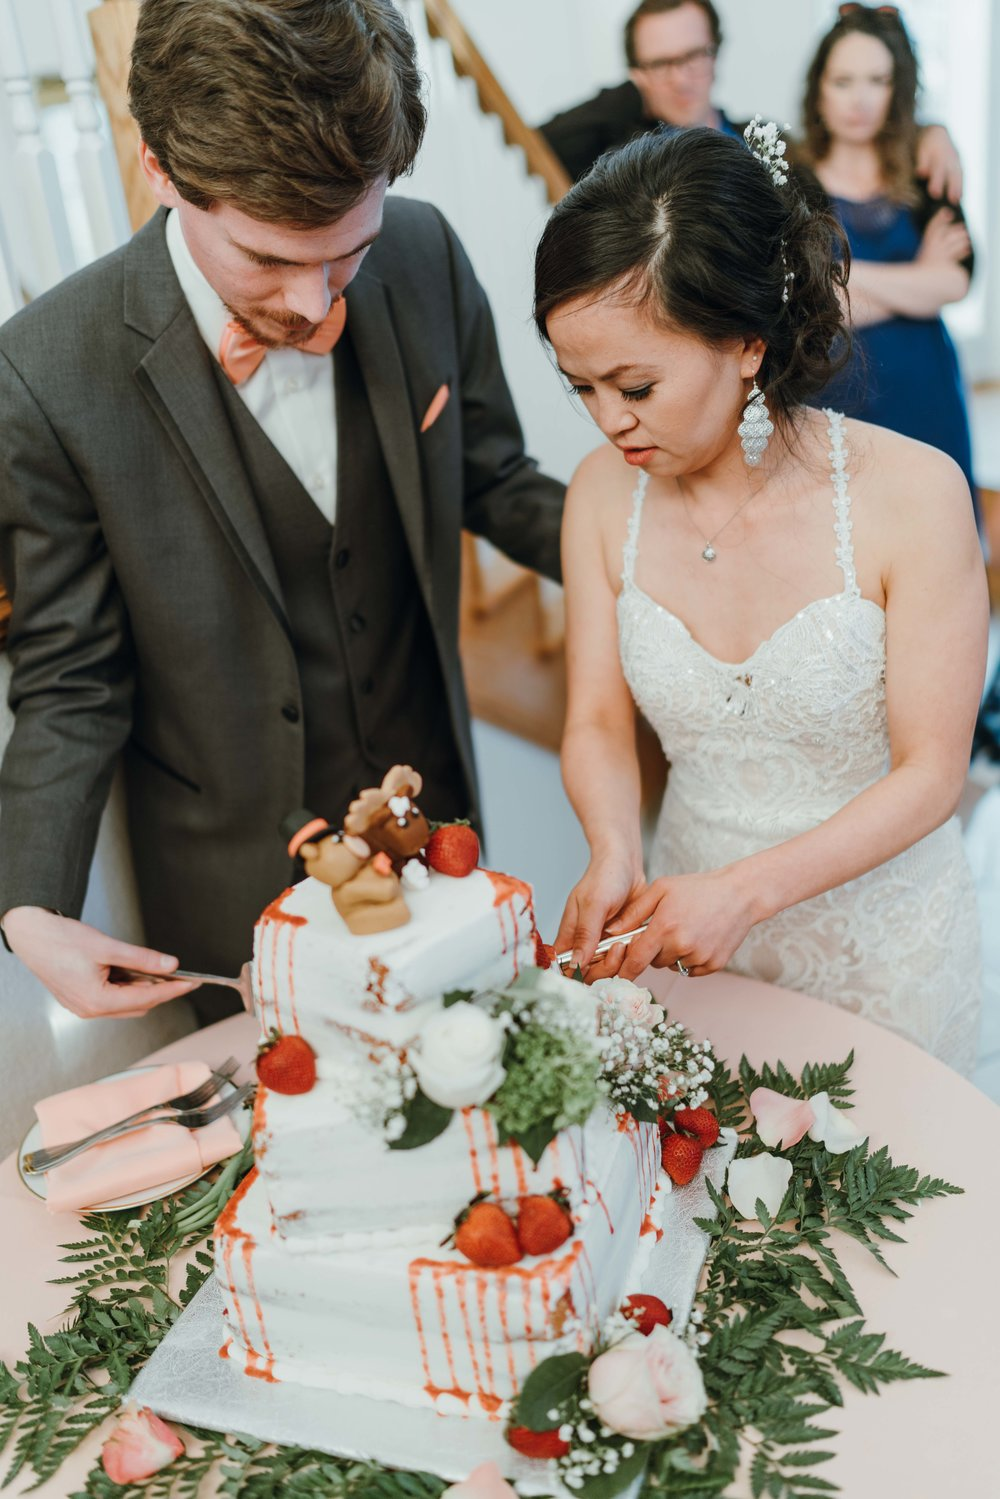 denver wedding photographer lioncrest manor in lyons ben and mali -DSC06627.jpg